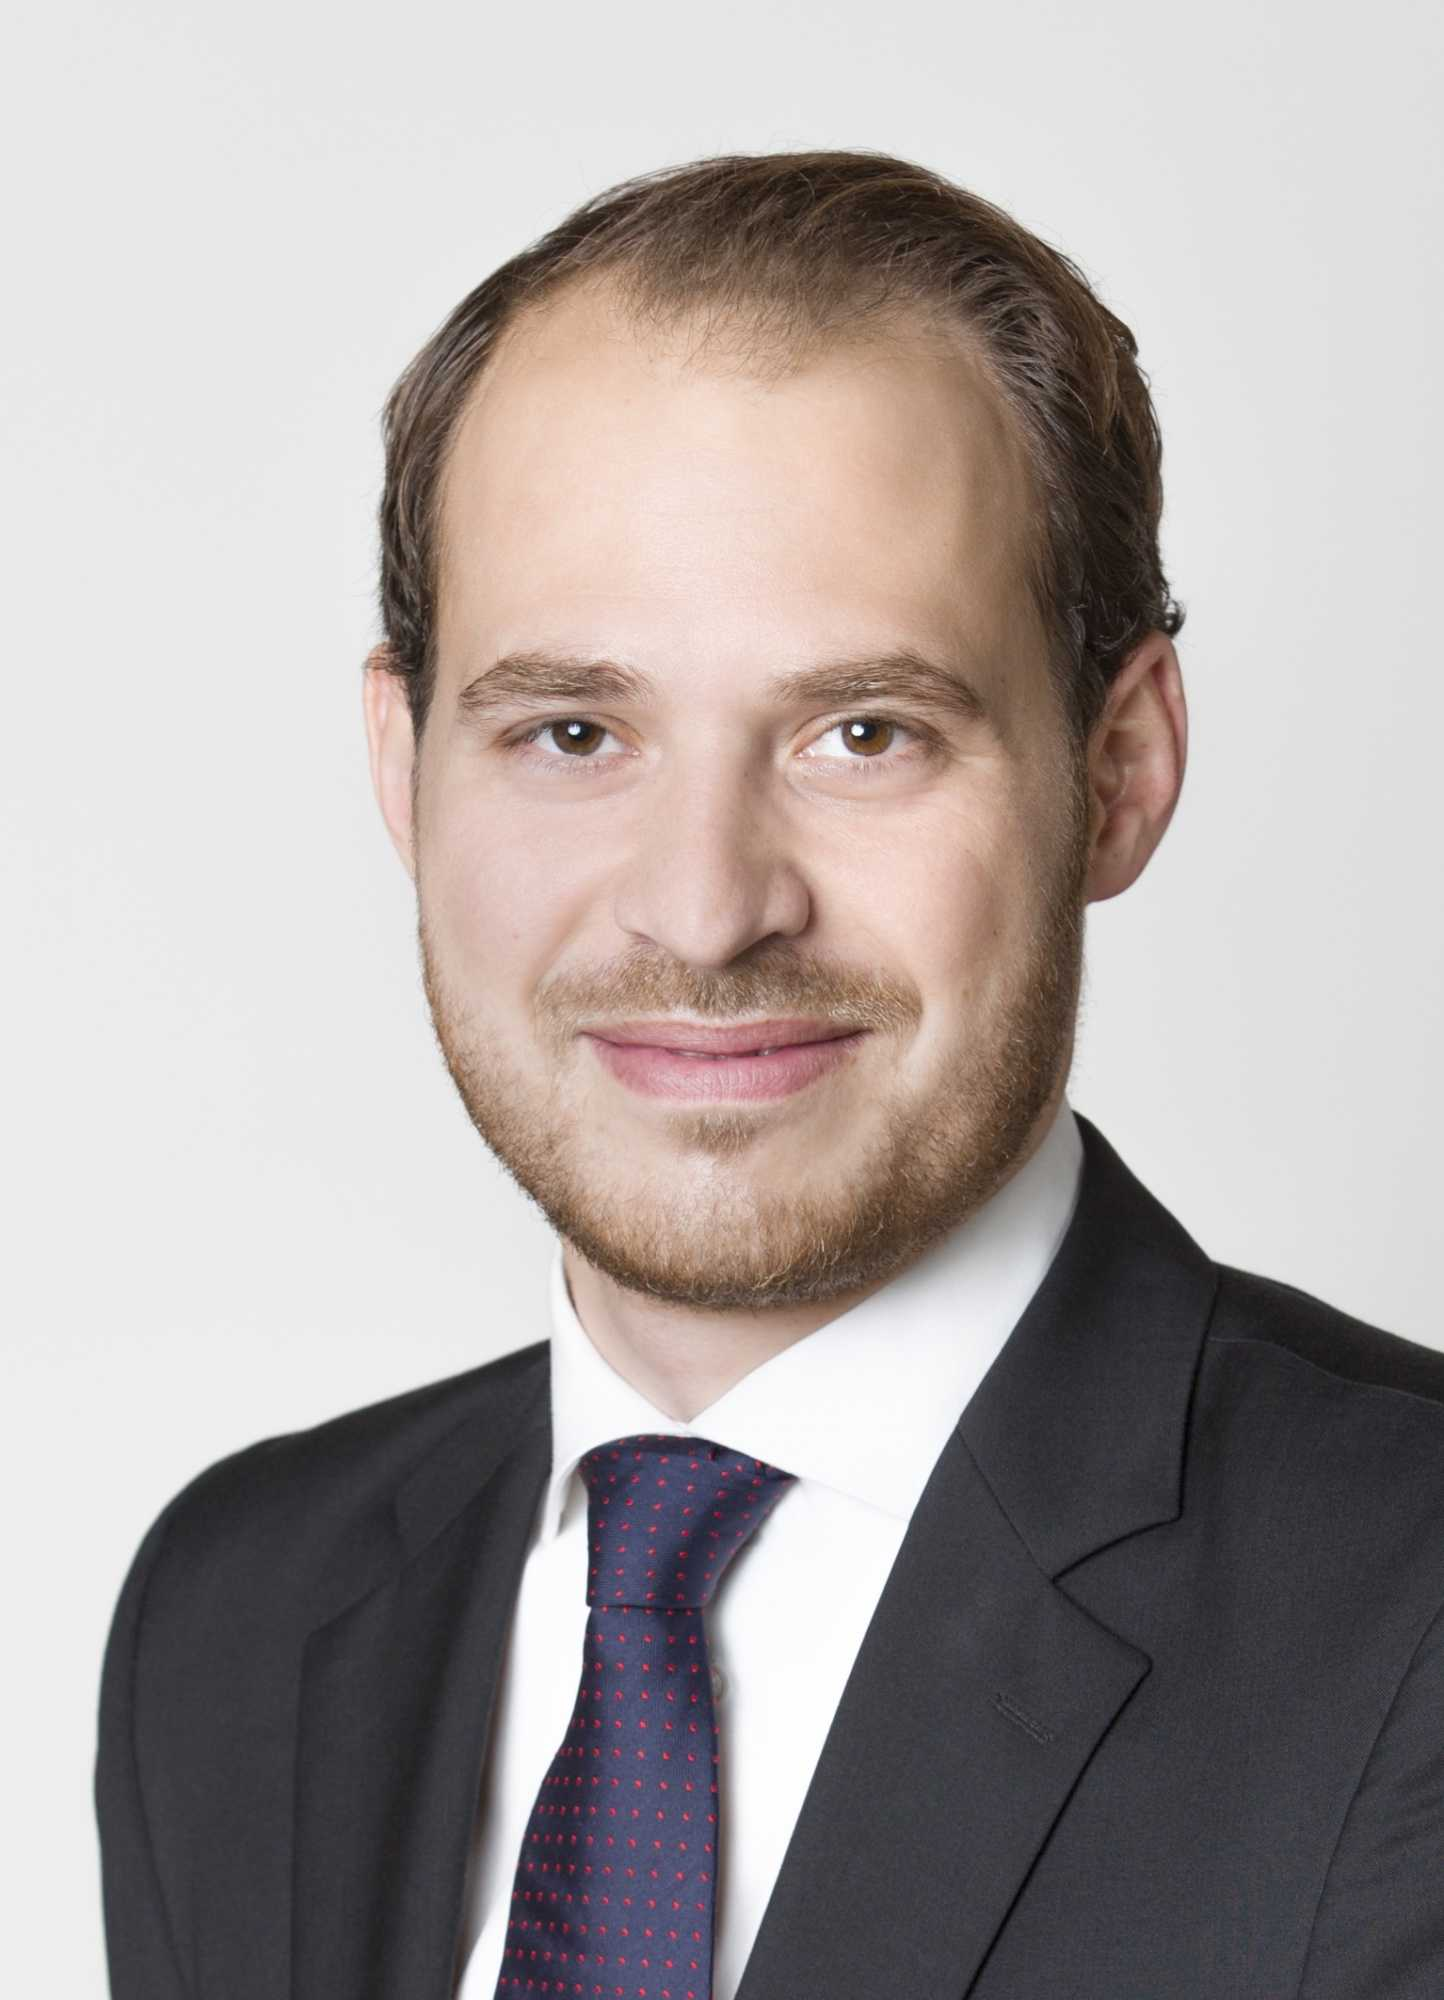 Nikolaus Scherak